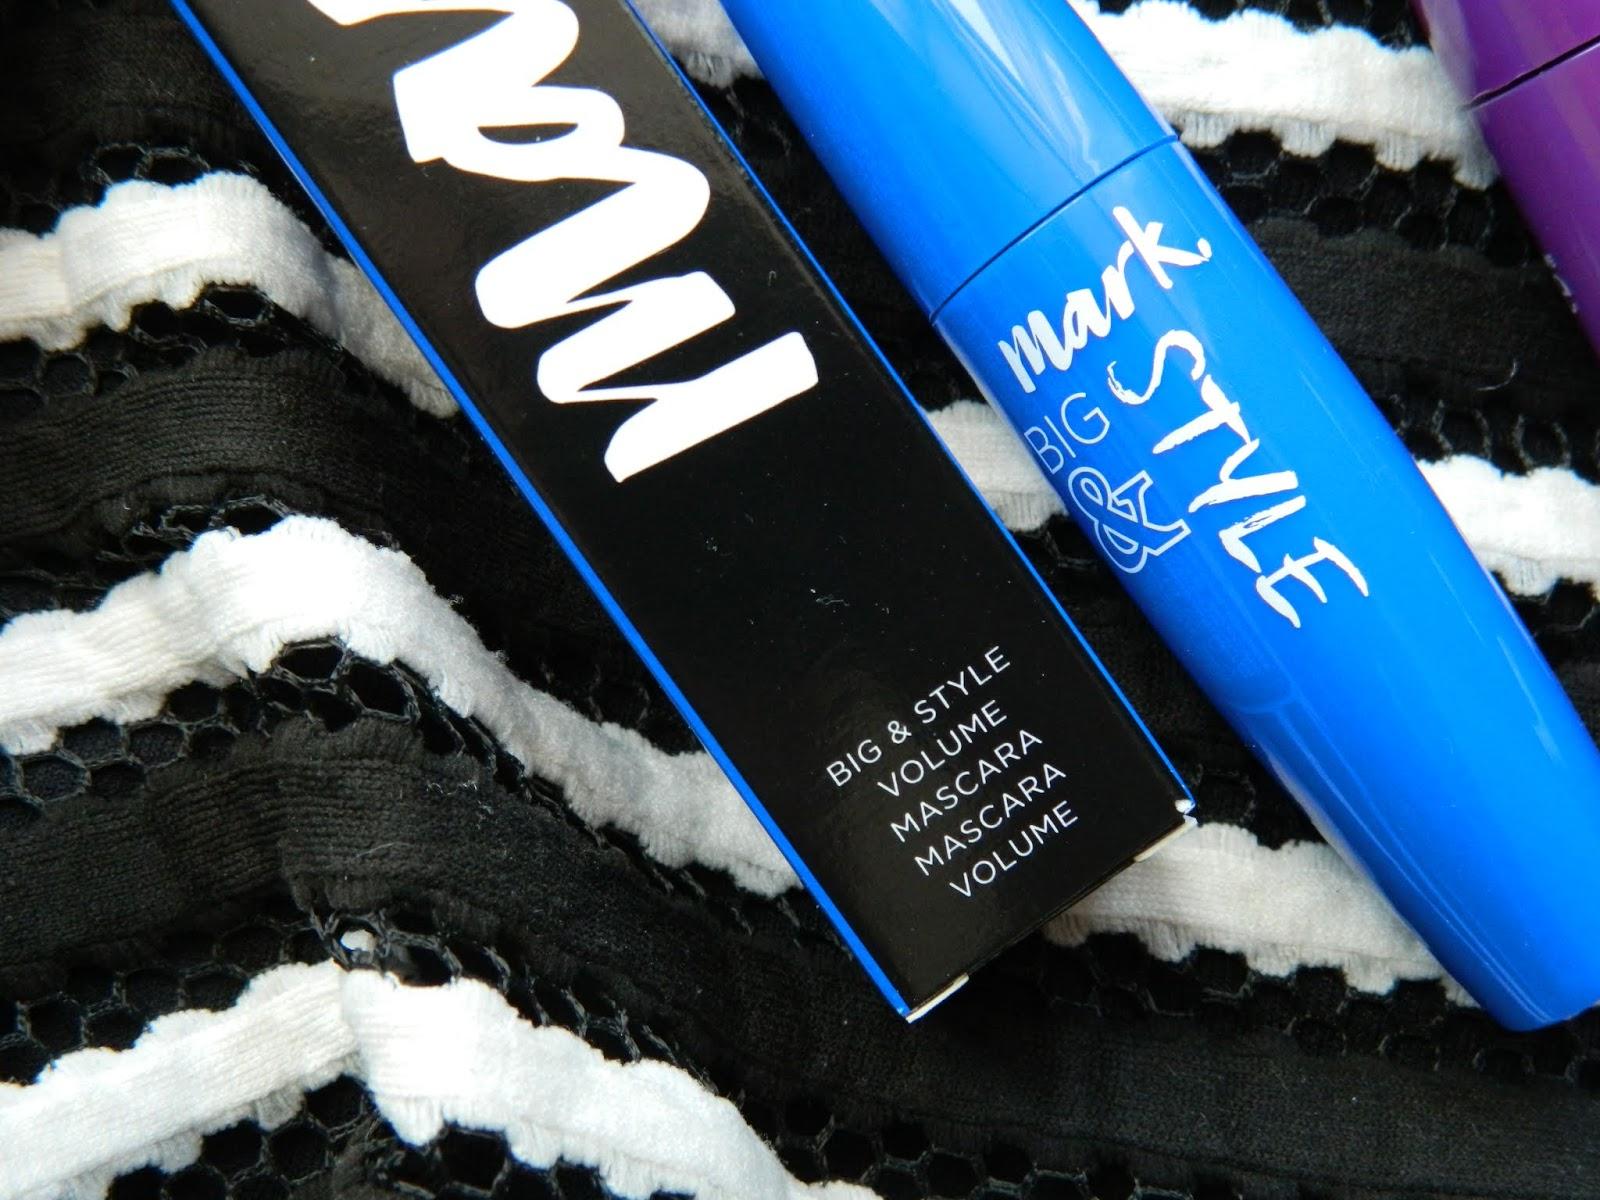 Avon Mark: 'Big & False Lash' and 'Big & Style'